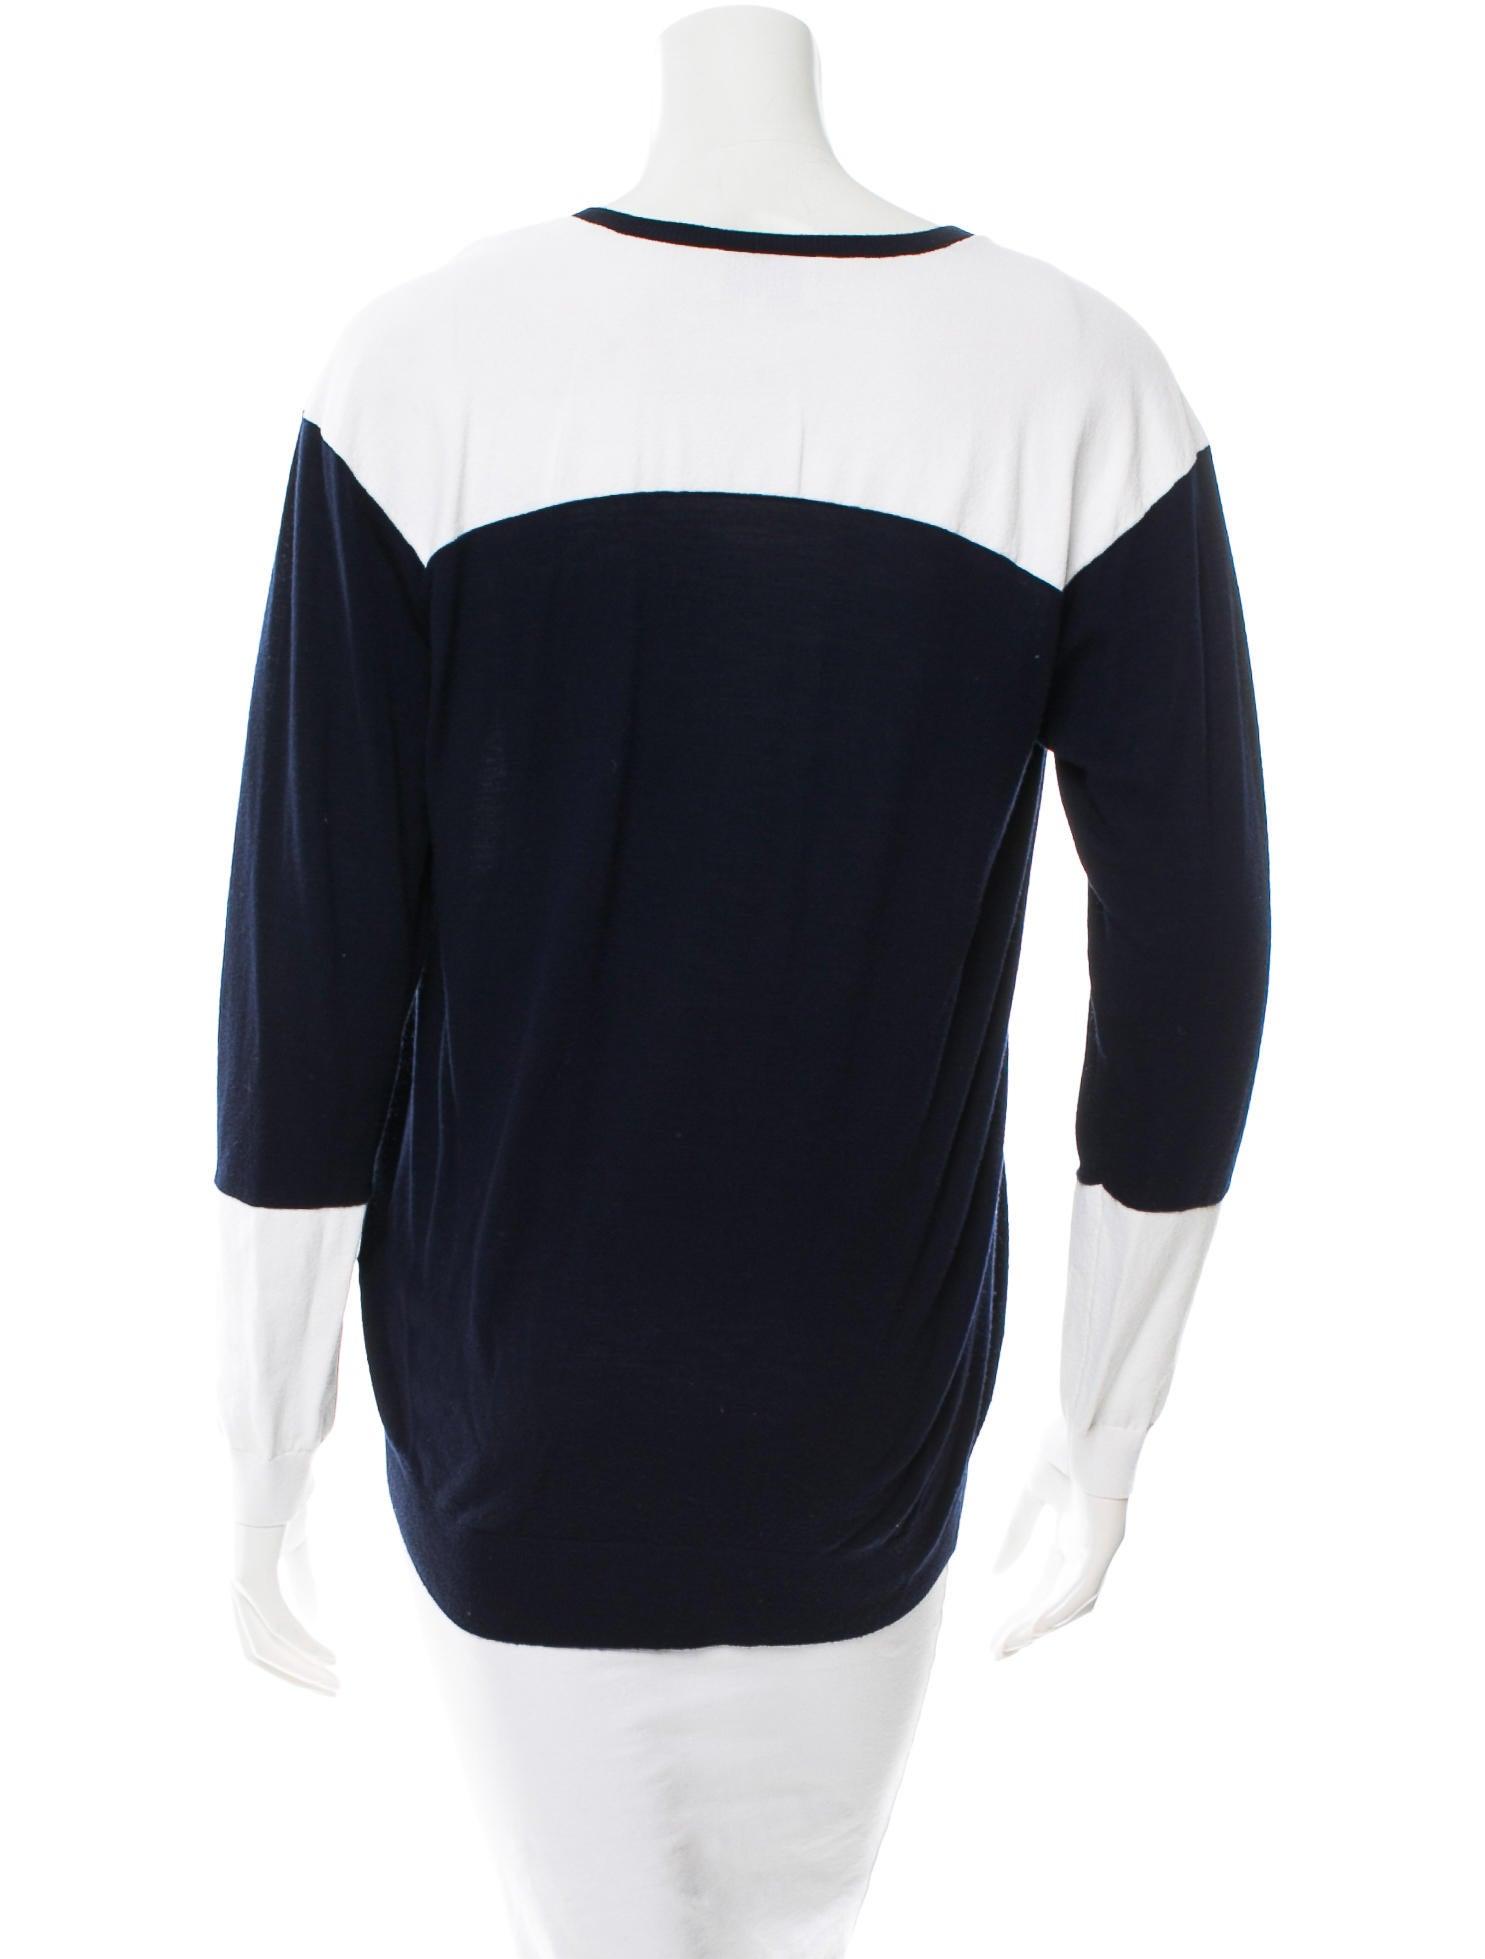 3 1 phillip lim merino wool top clothing w31ph30697 for Best wool shirt jackets